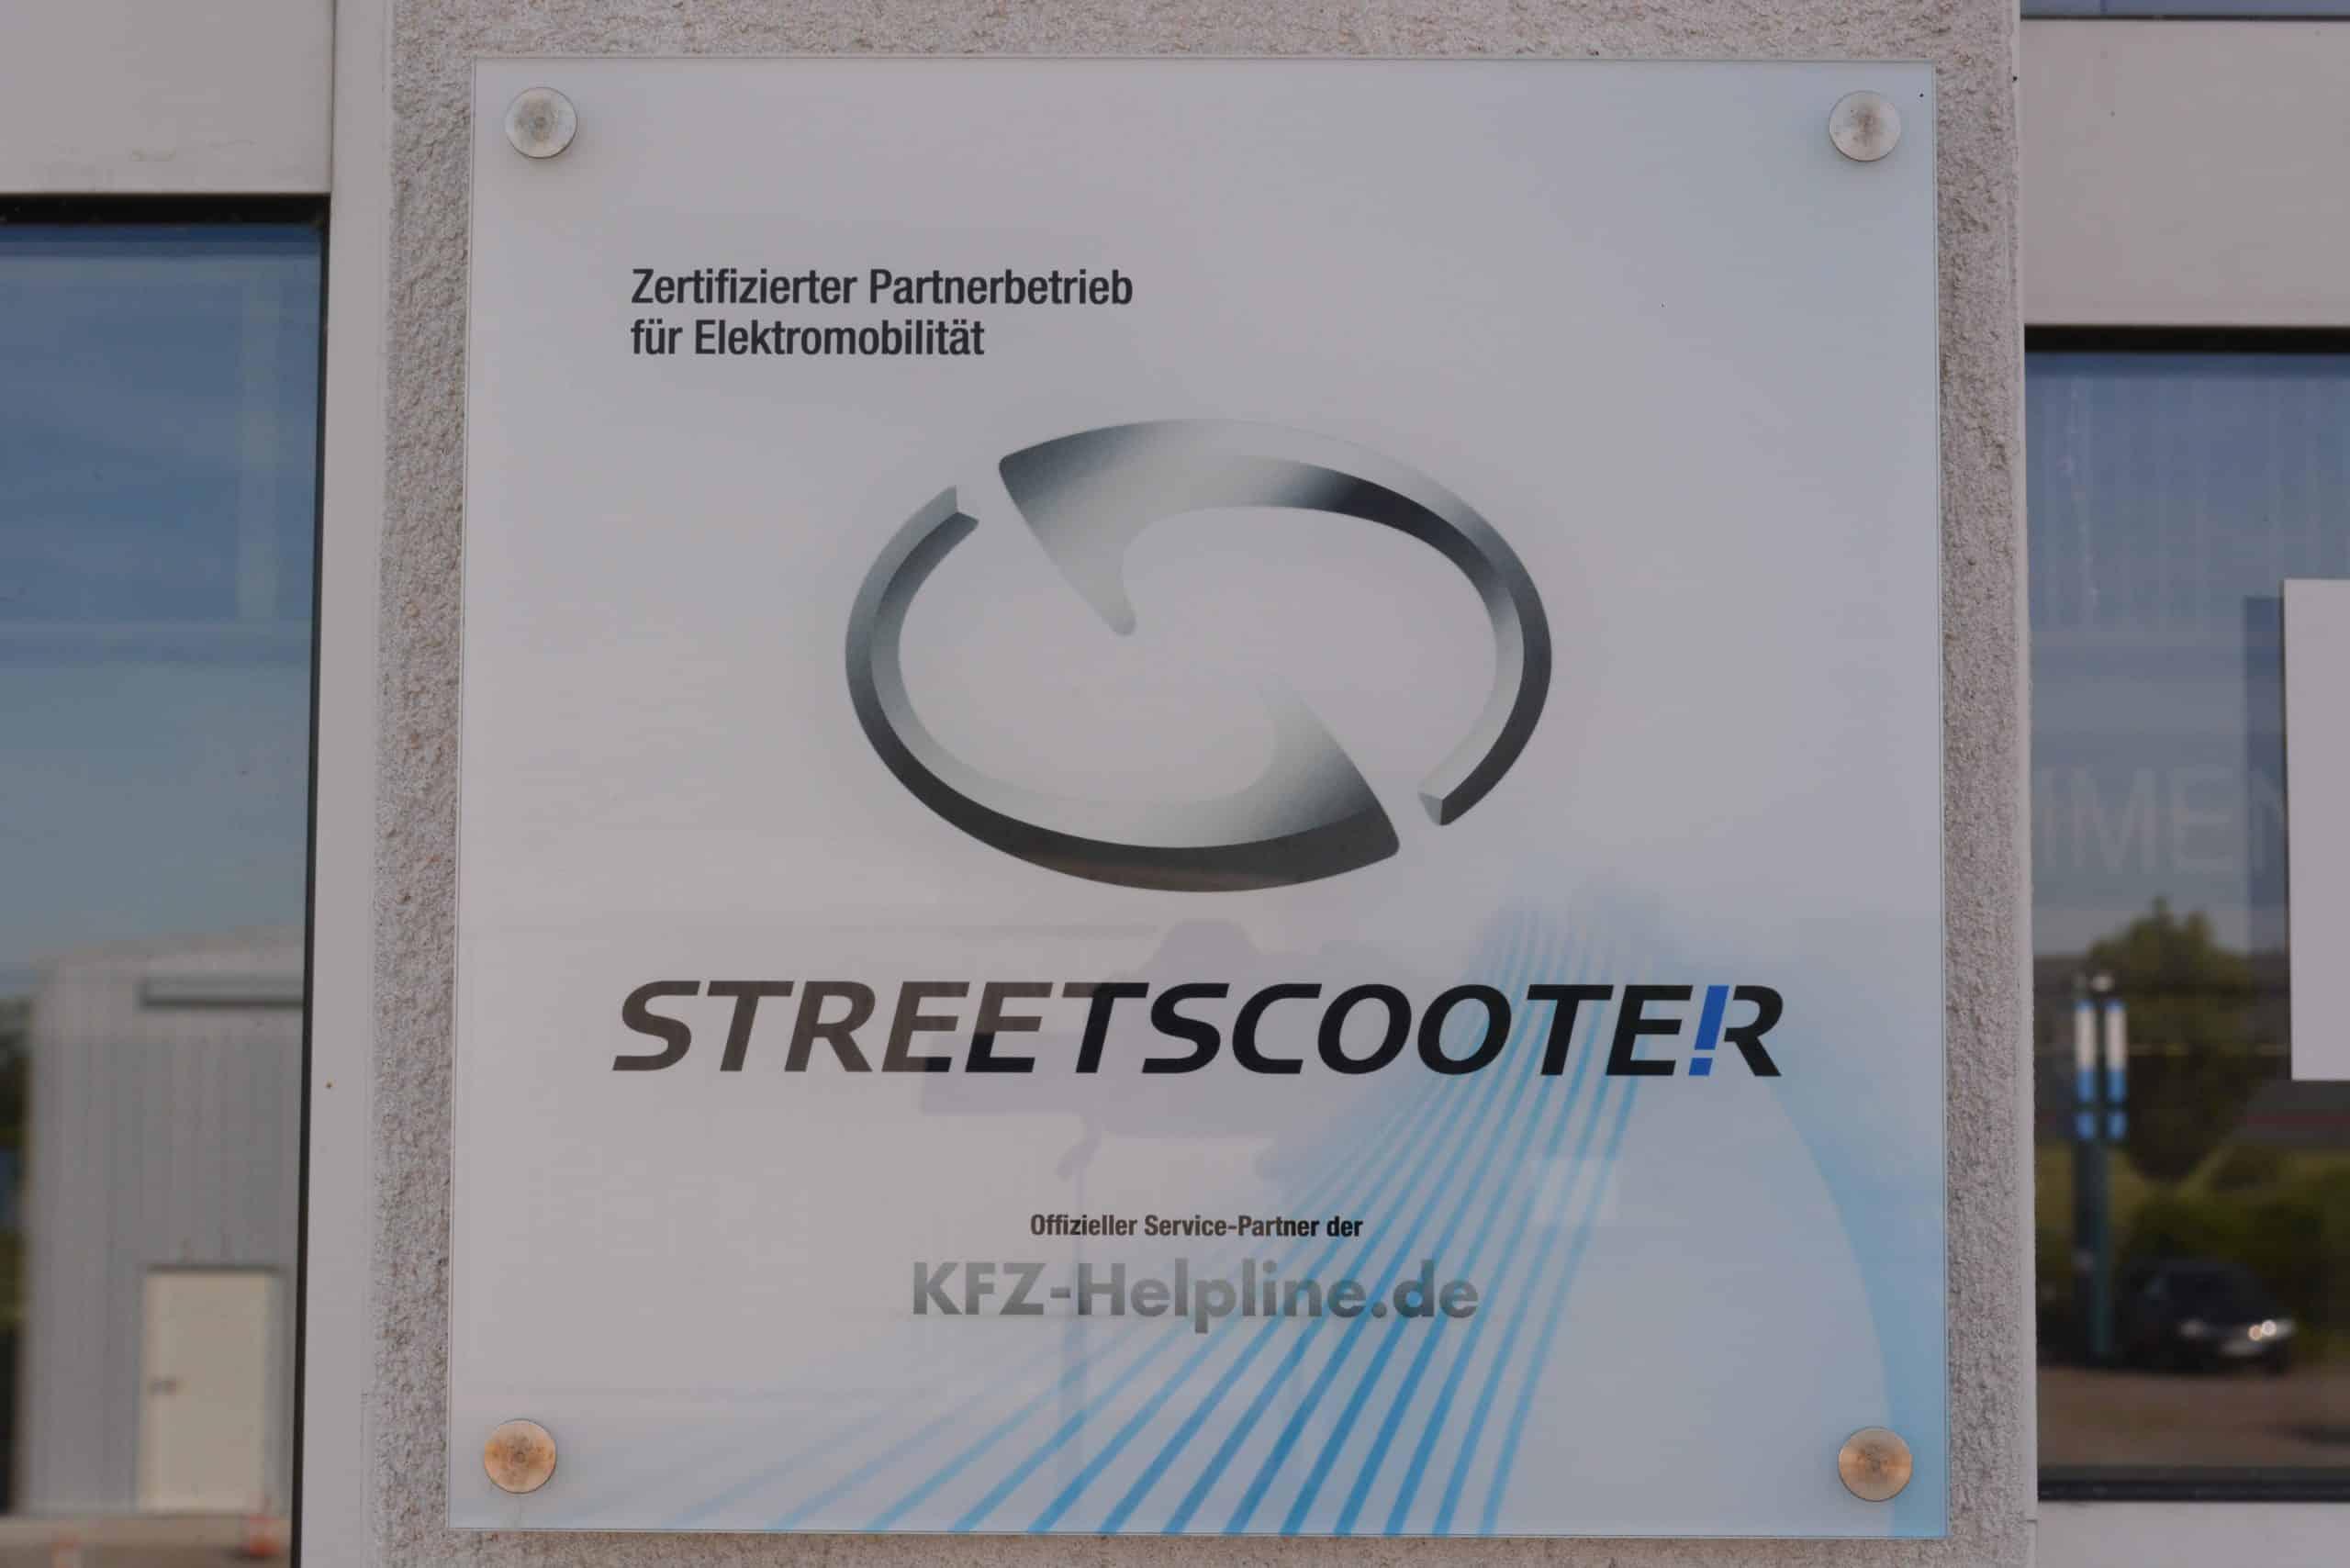 STREETSCOOTER SERVICEPARTNER